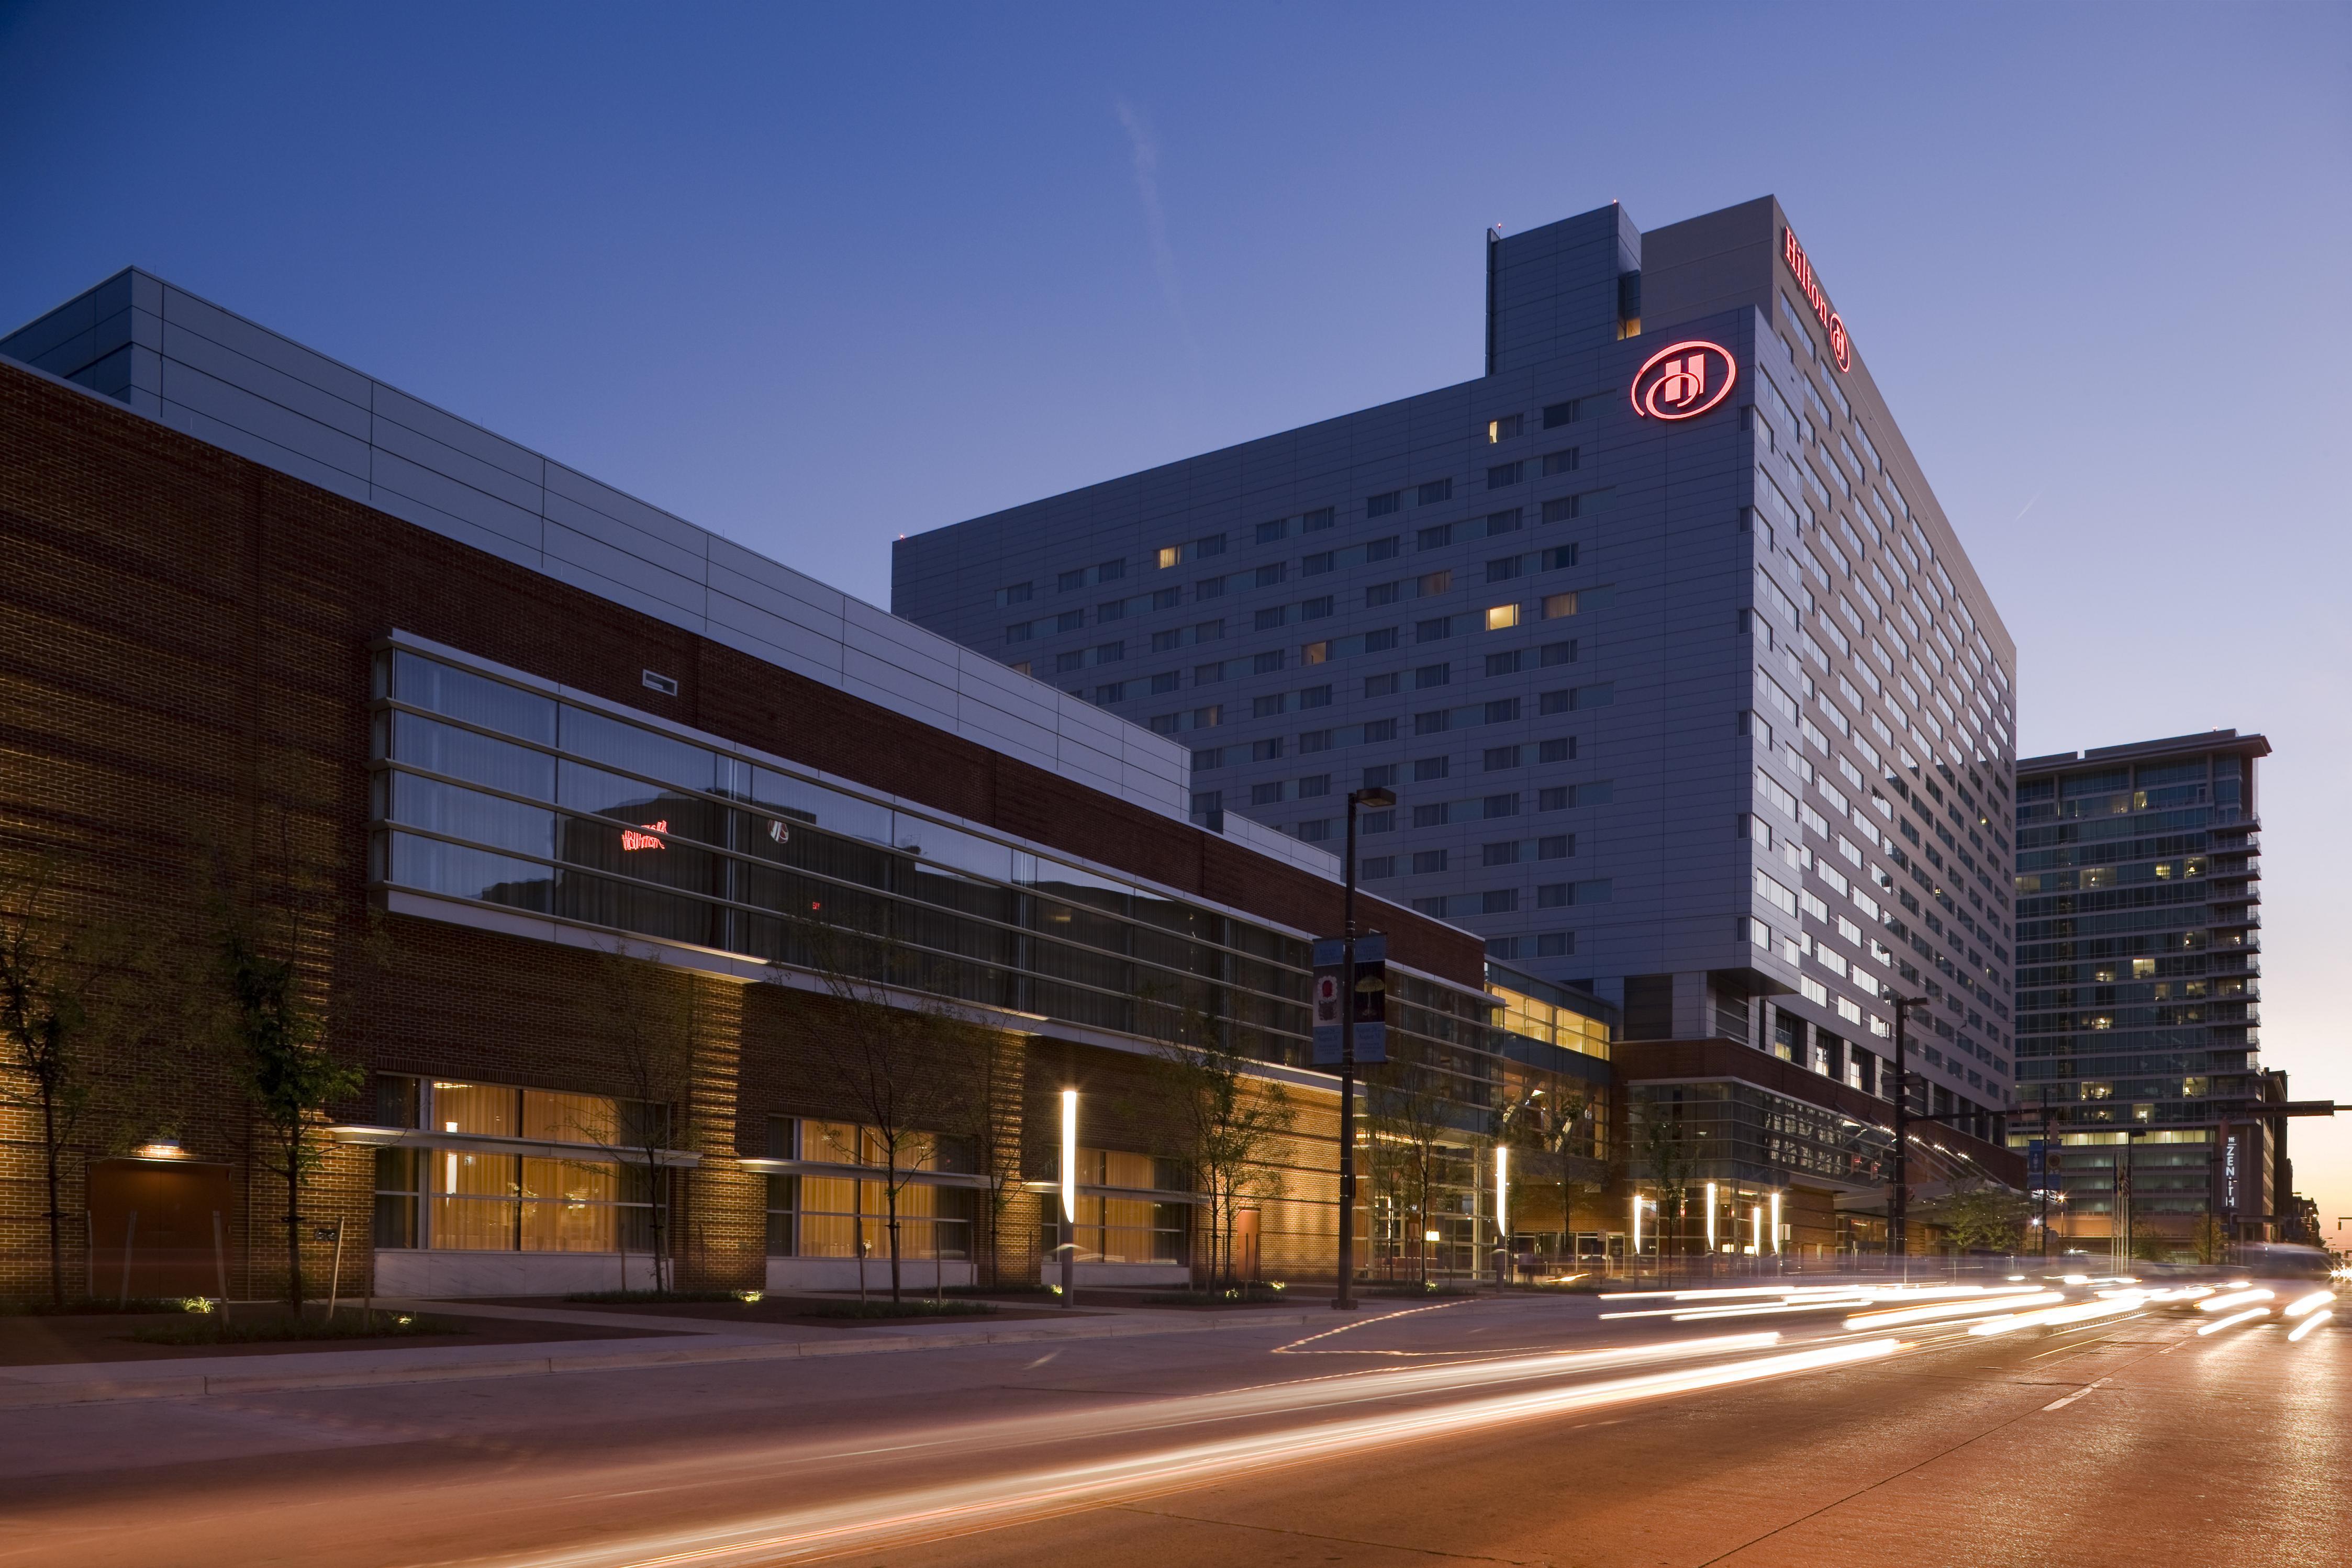 HiltonBaltimore.jpg